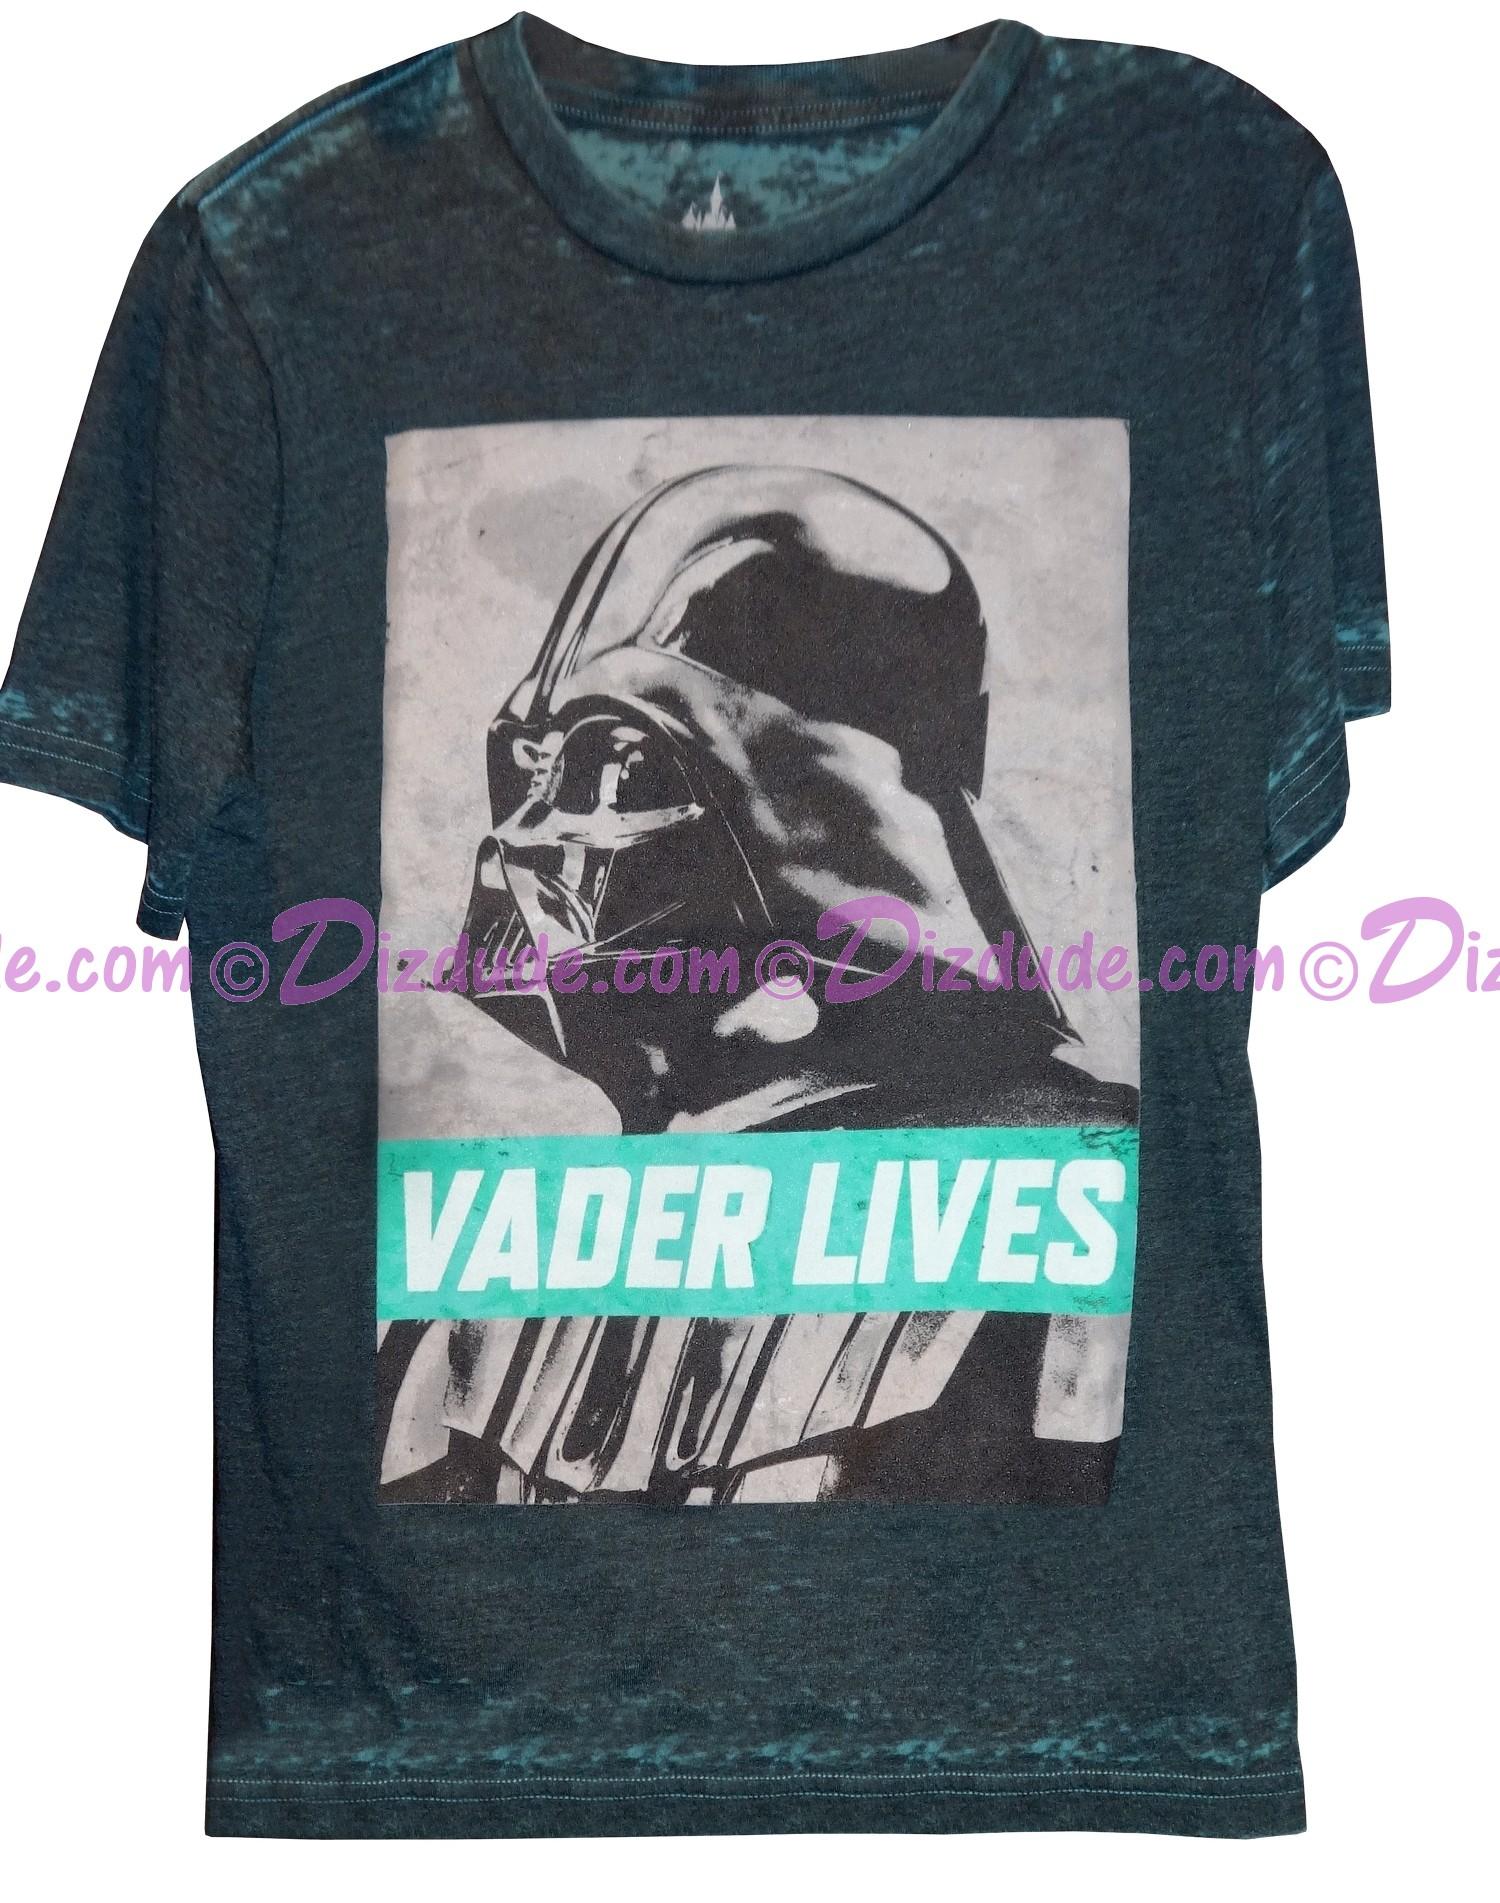 Darth Vader Lives Youth T-Shirt (Tshirt, T shirt or Tee) - Disney's Star Wars © Dizdude.com